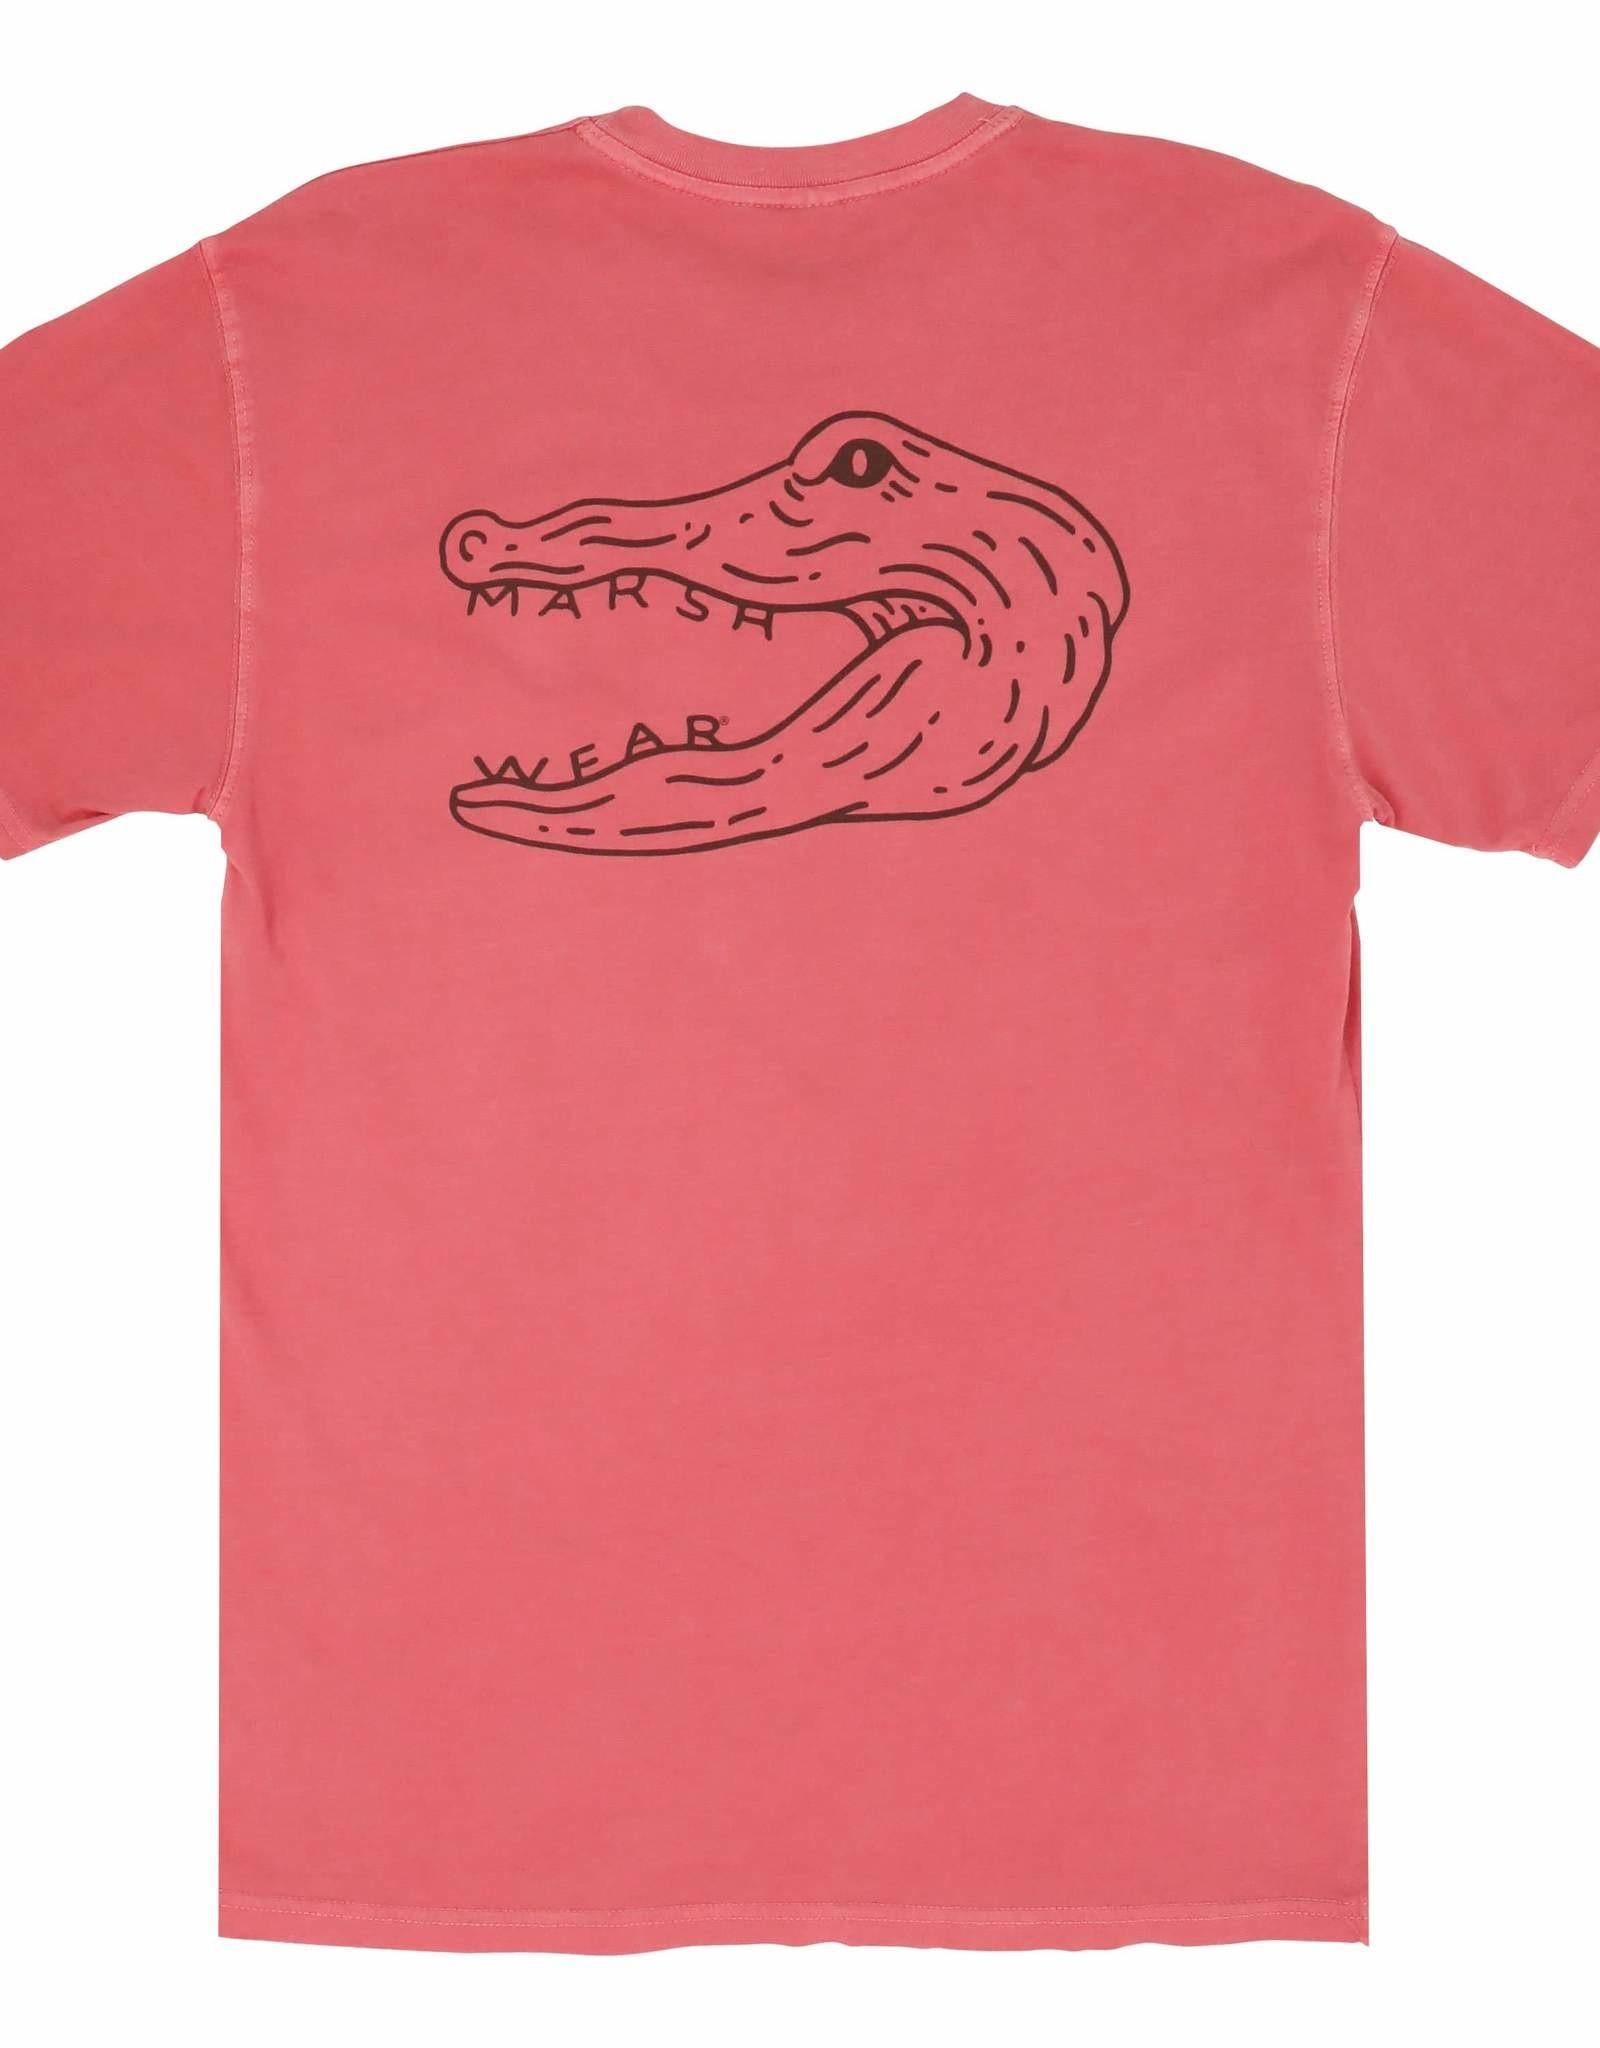 Marsh Wear Marsh Gator Tee